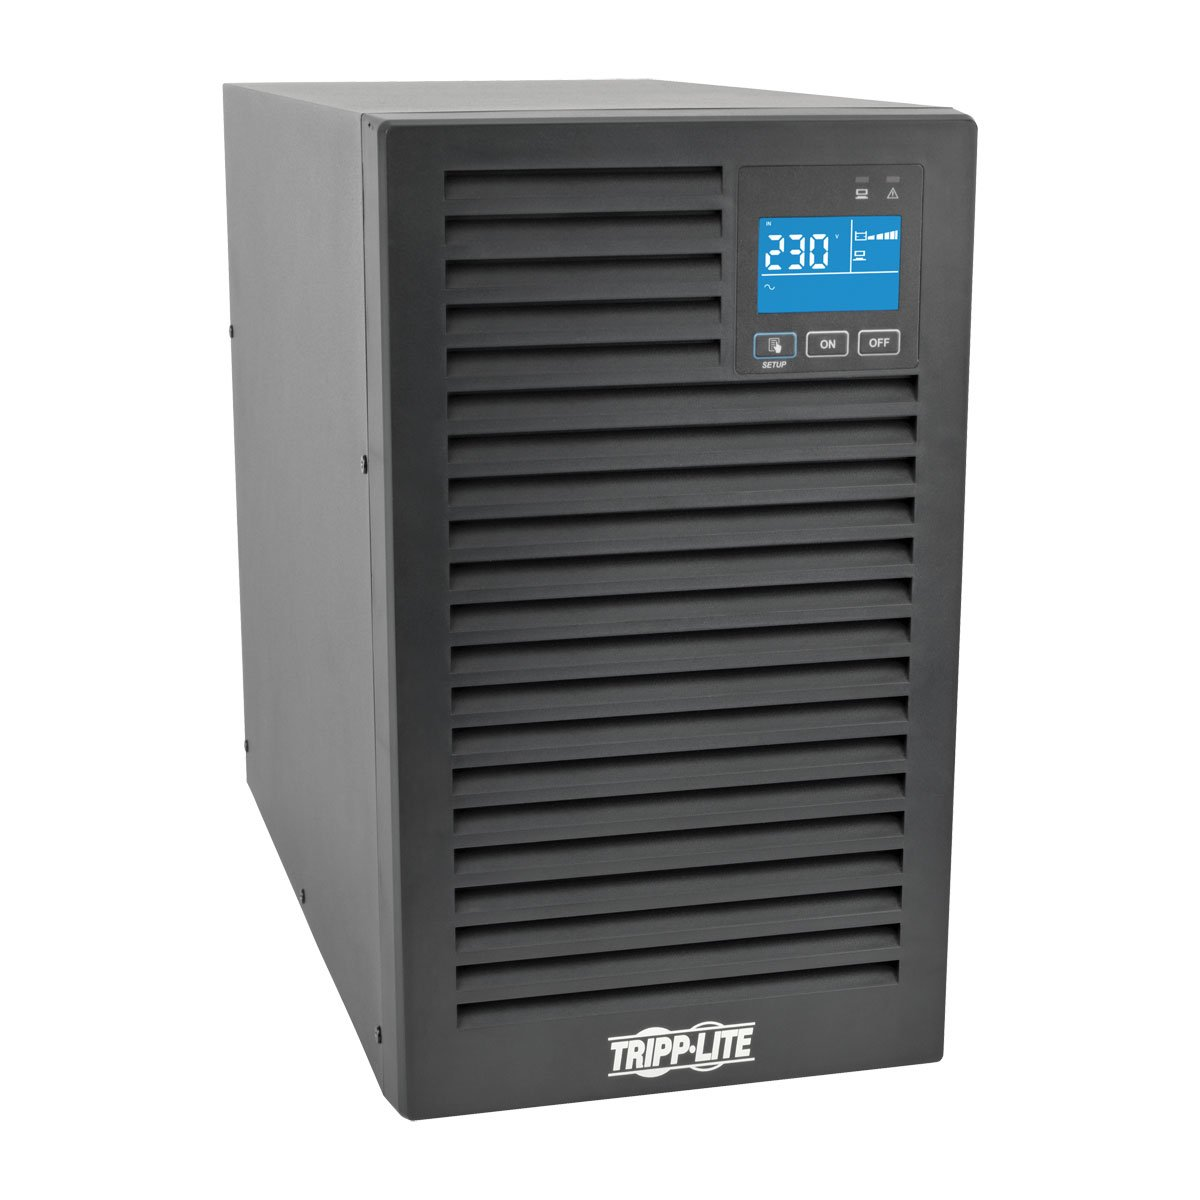 Tripp Lite - Tripp Lite SmartOnline 230V 2kVA 1800W On-Line Double-Conversion